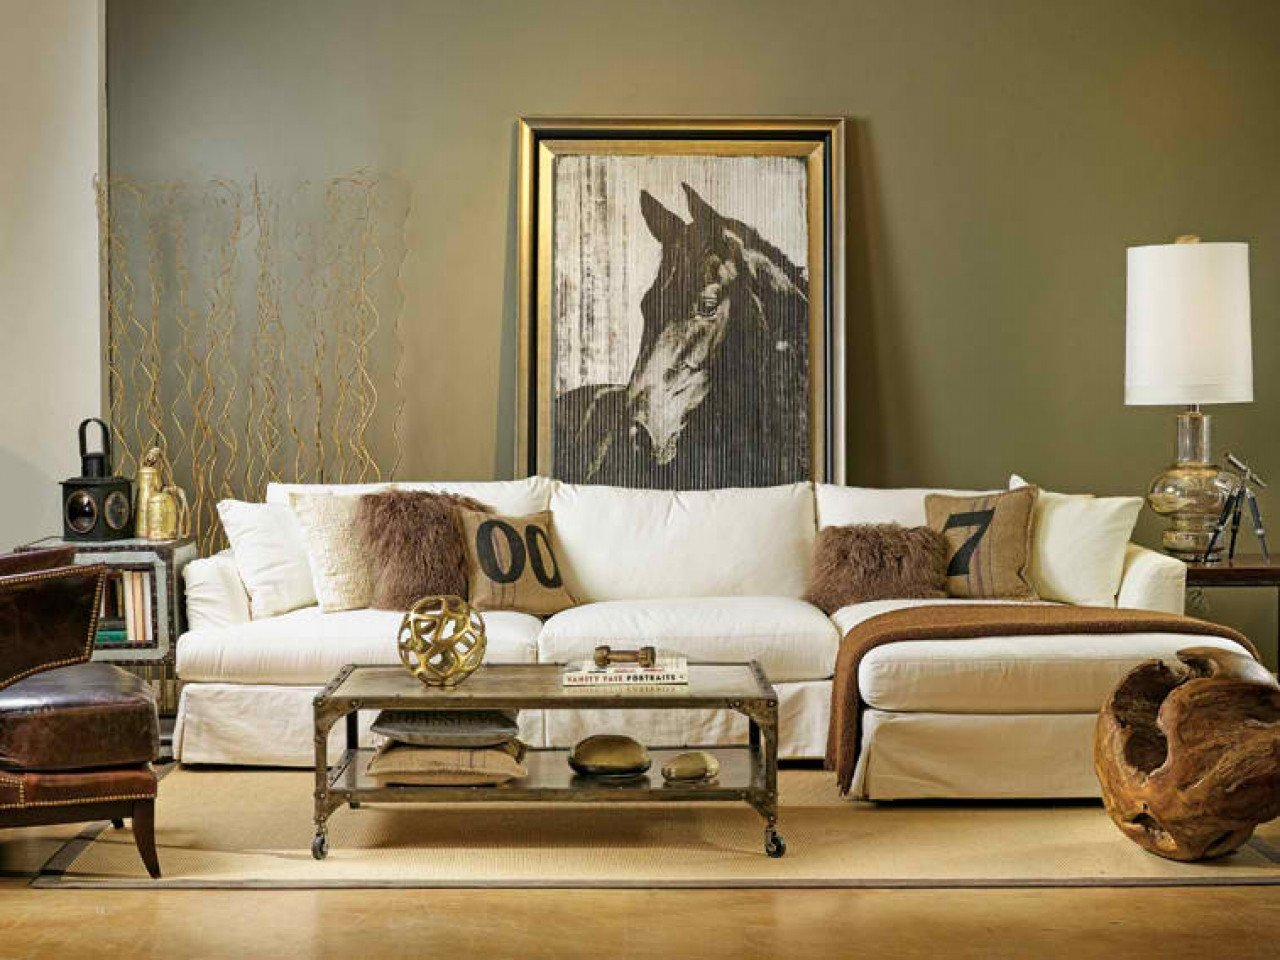 Country Chic Living Room Decor Modern Boho Decor Industrial Country Chic Living Room